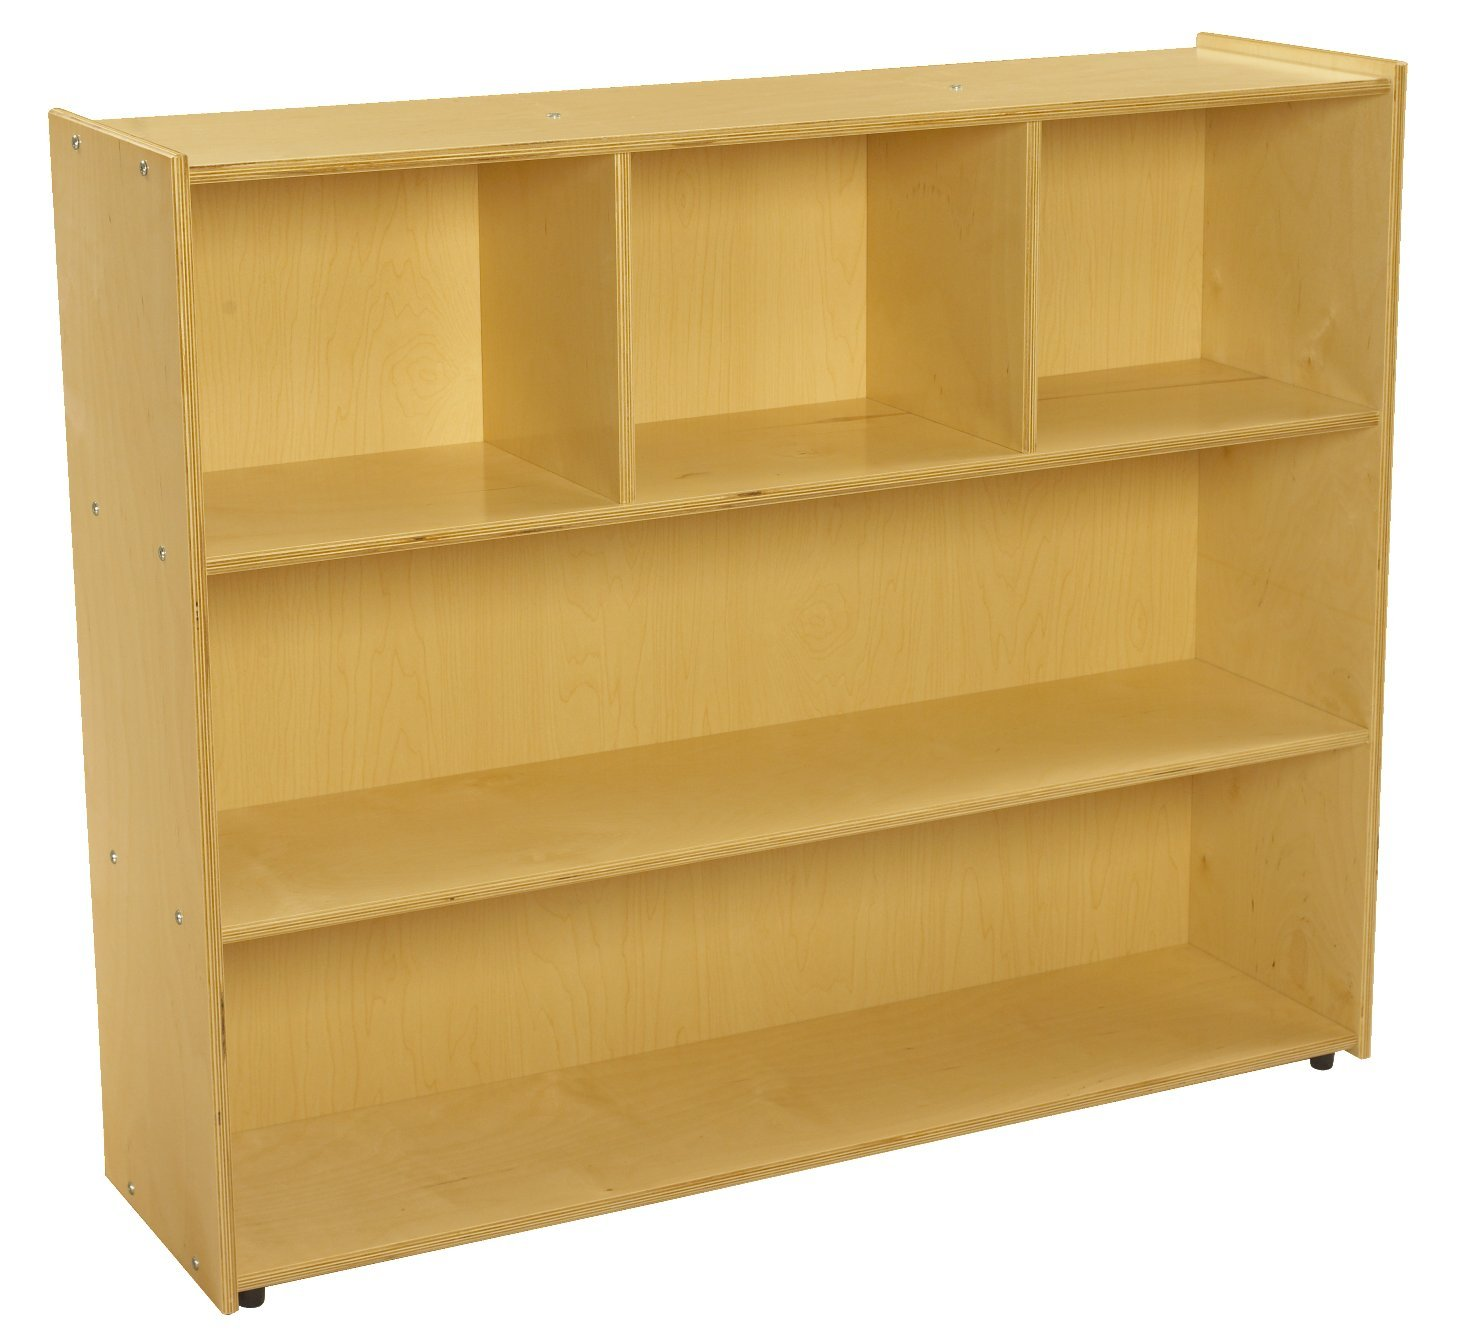 Childcraft 1526308 ABC Furnishings 3-Shelf Storage Unit, 40'' Height, 13'' Width, 48'' Length, Natural Wood